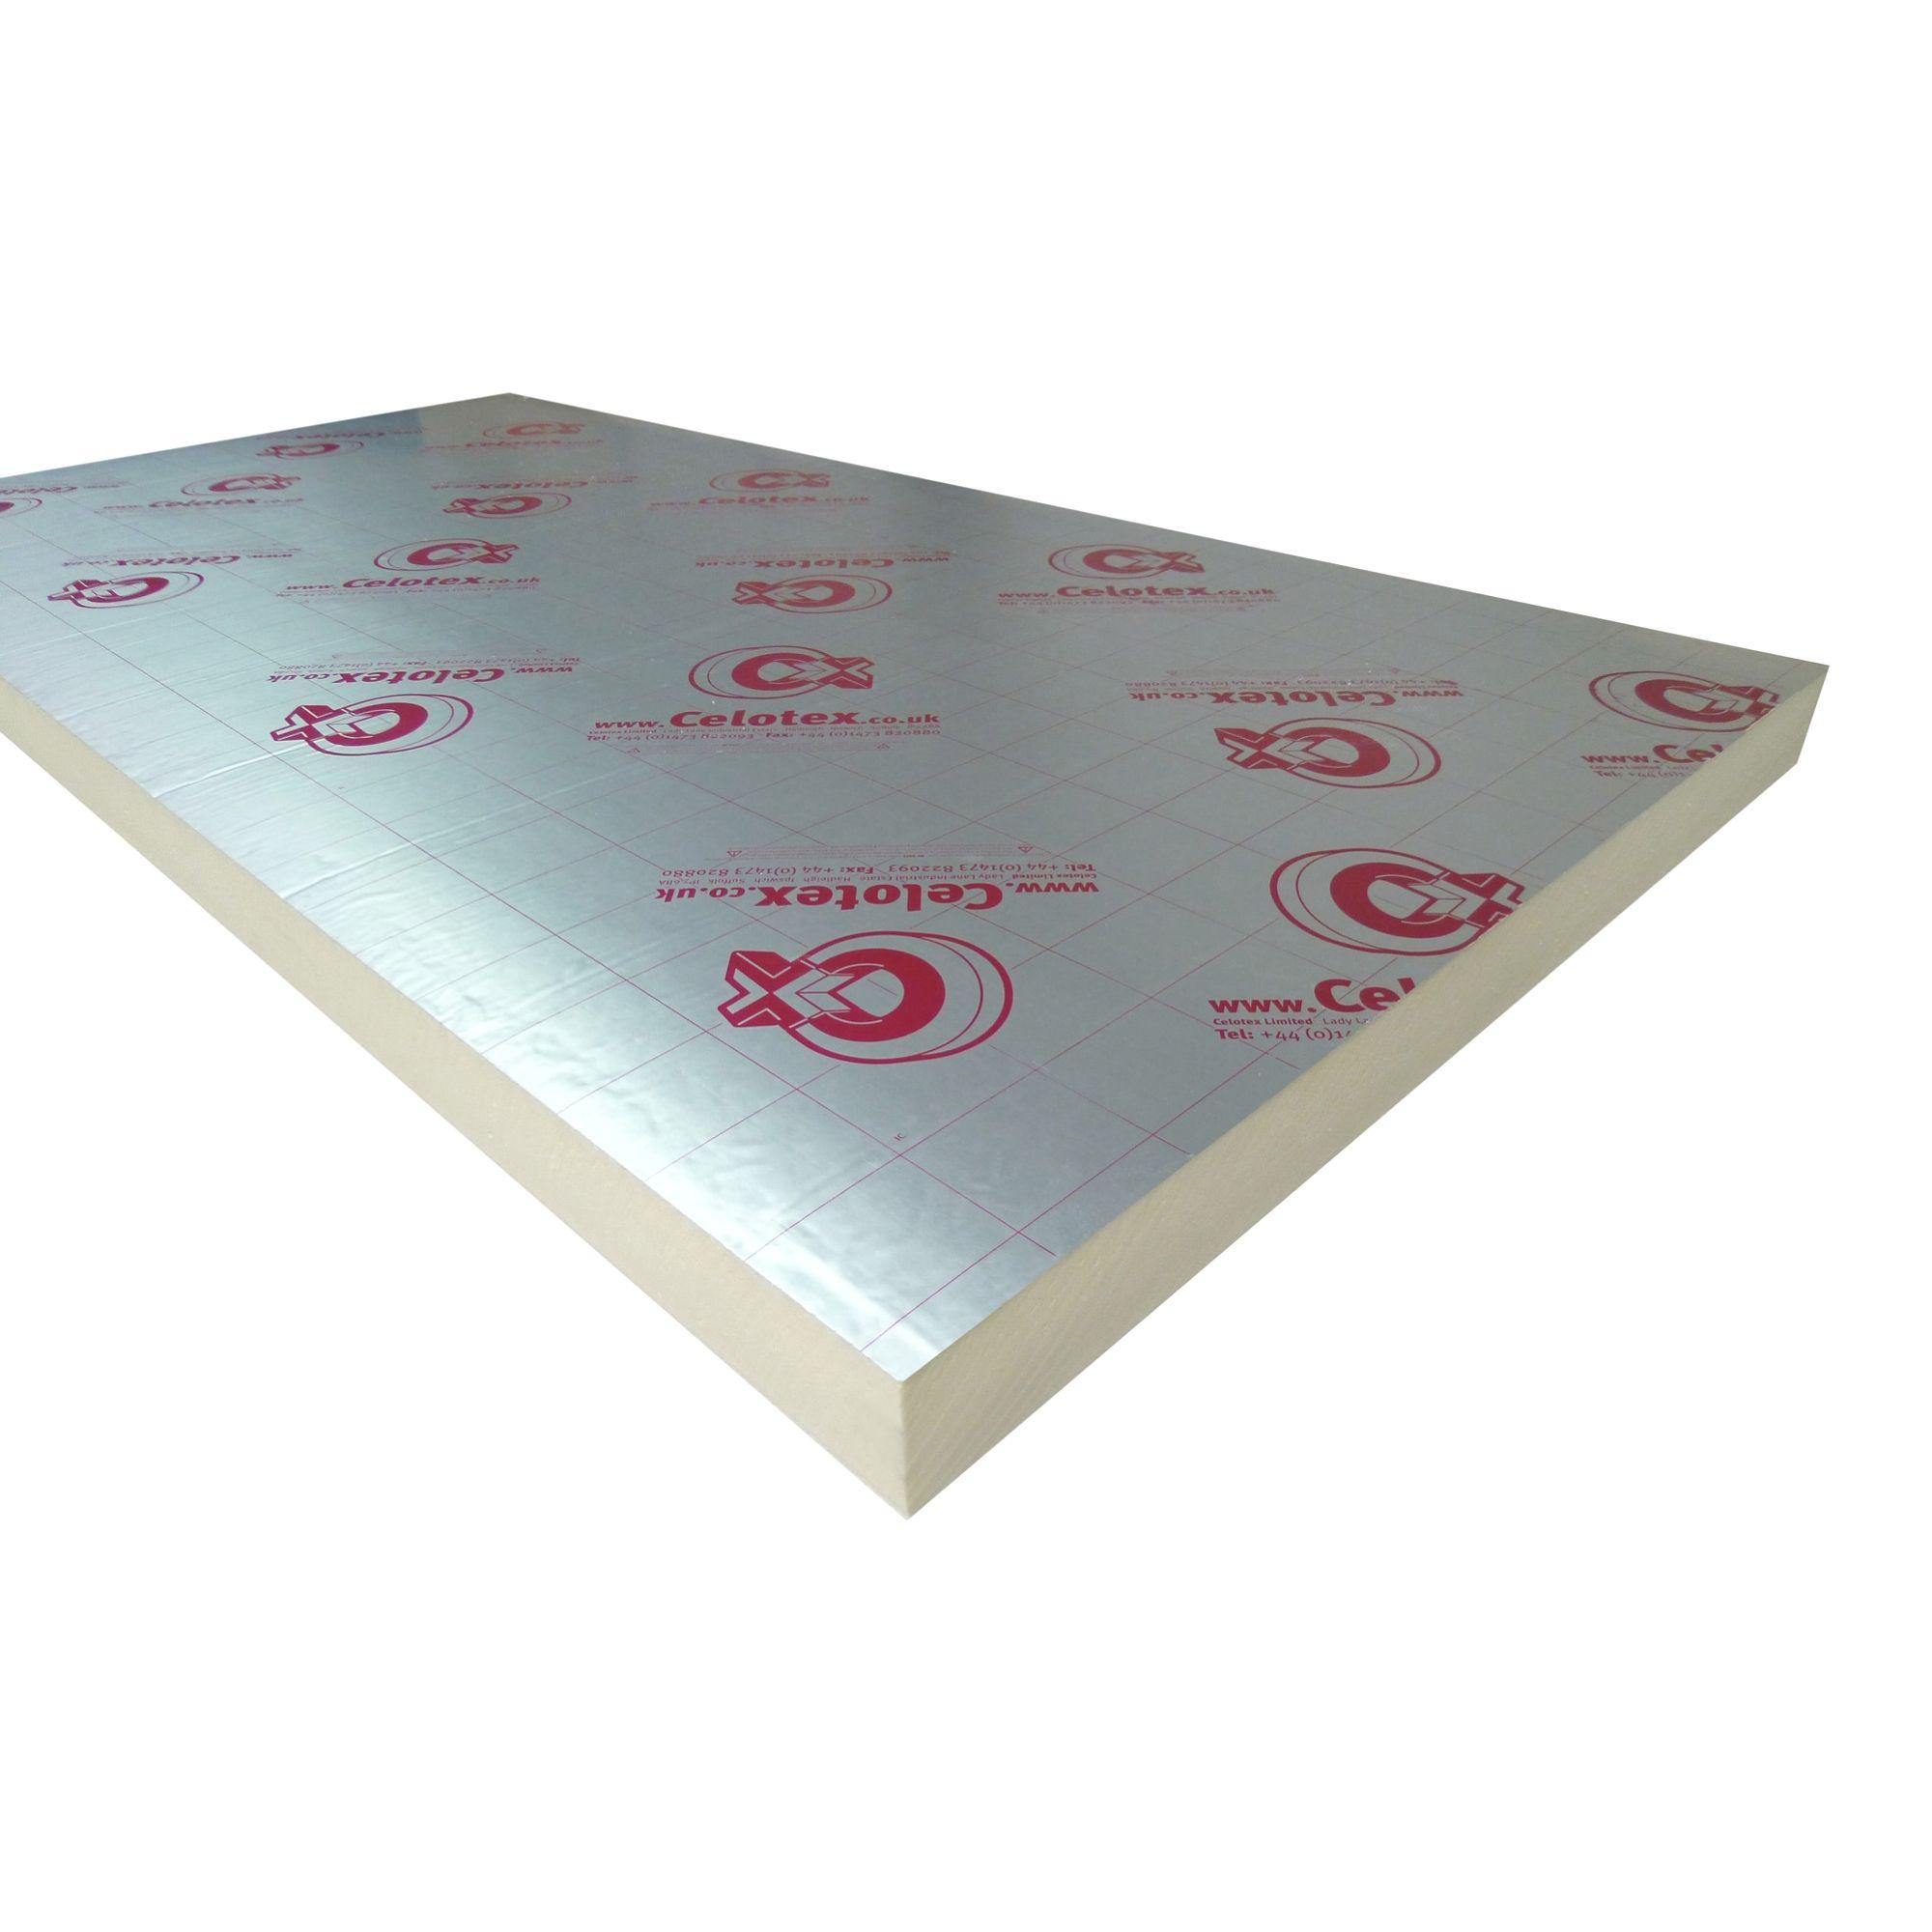 Celotex Cw4000 Insulation Board 1200mm 450mm 50mm